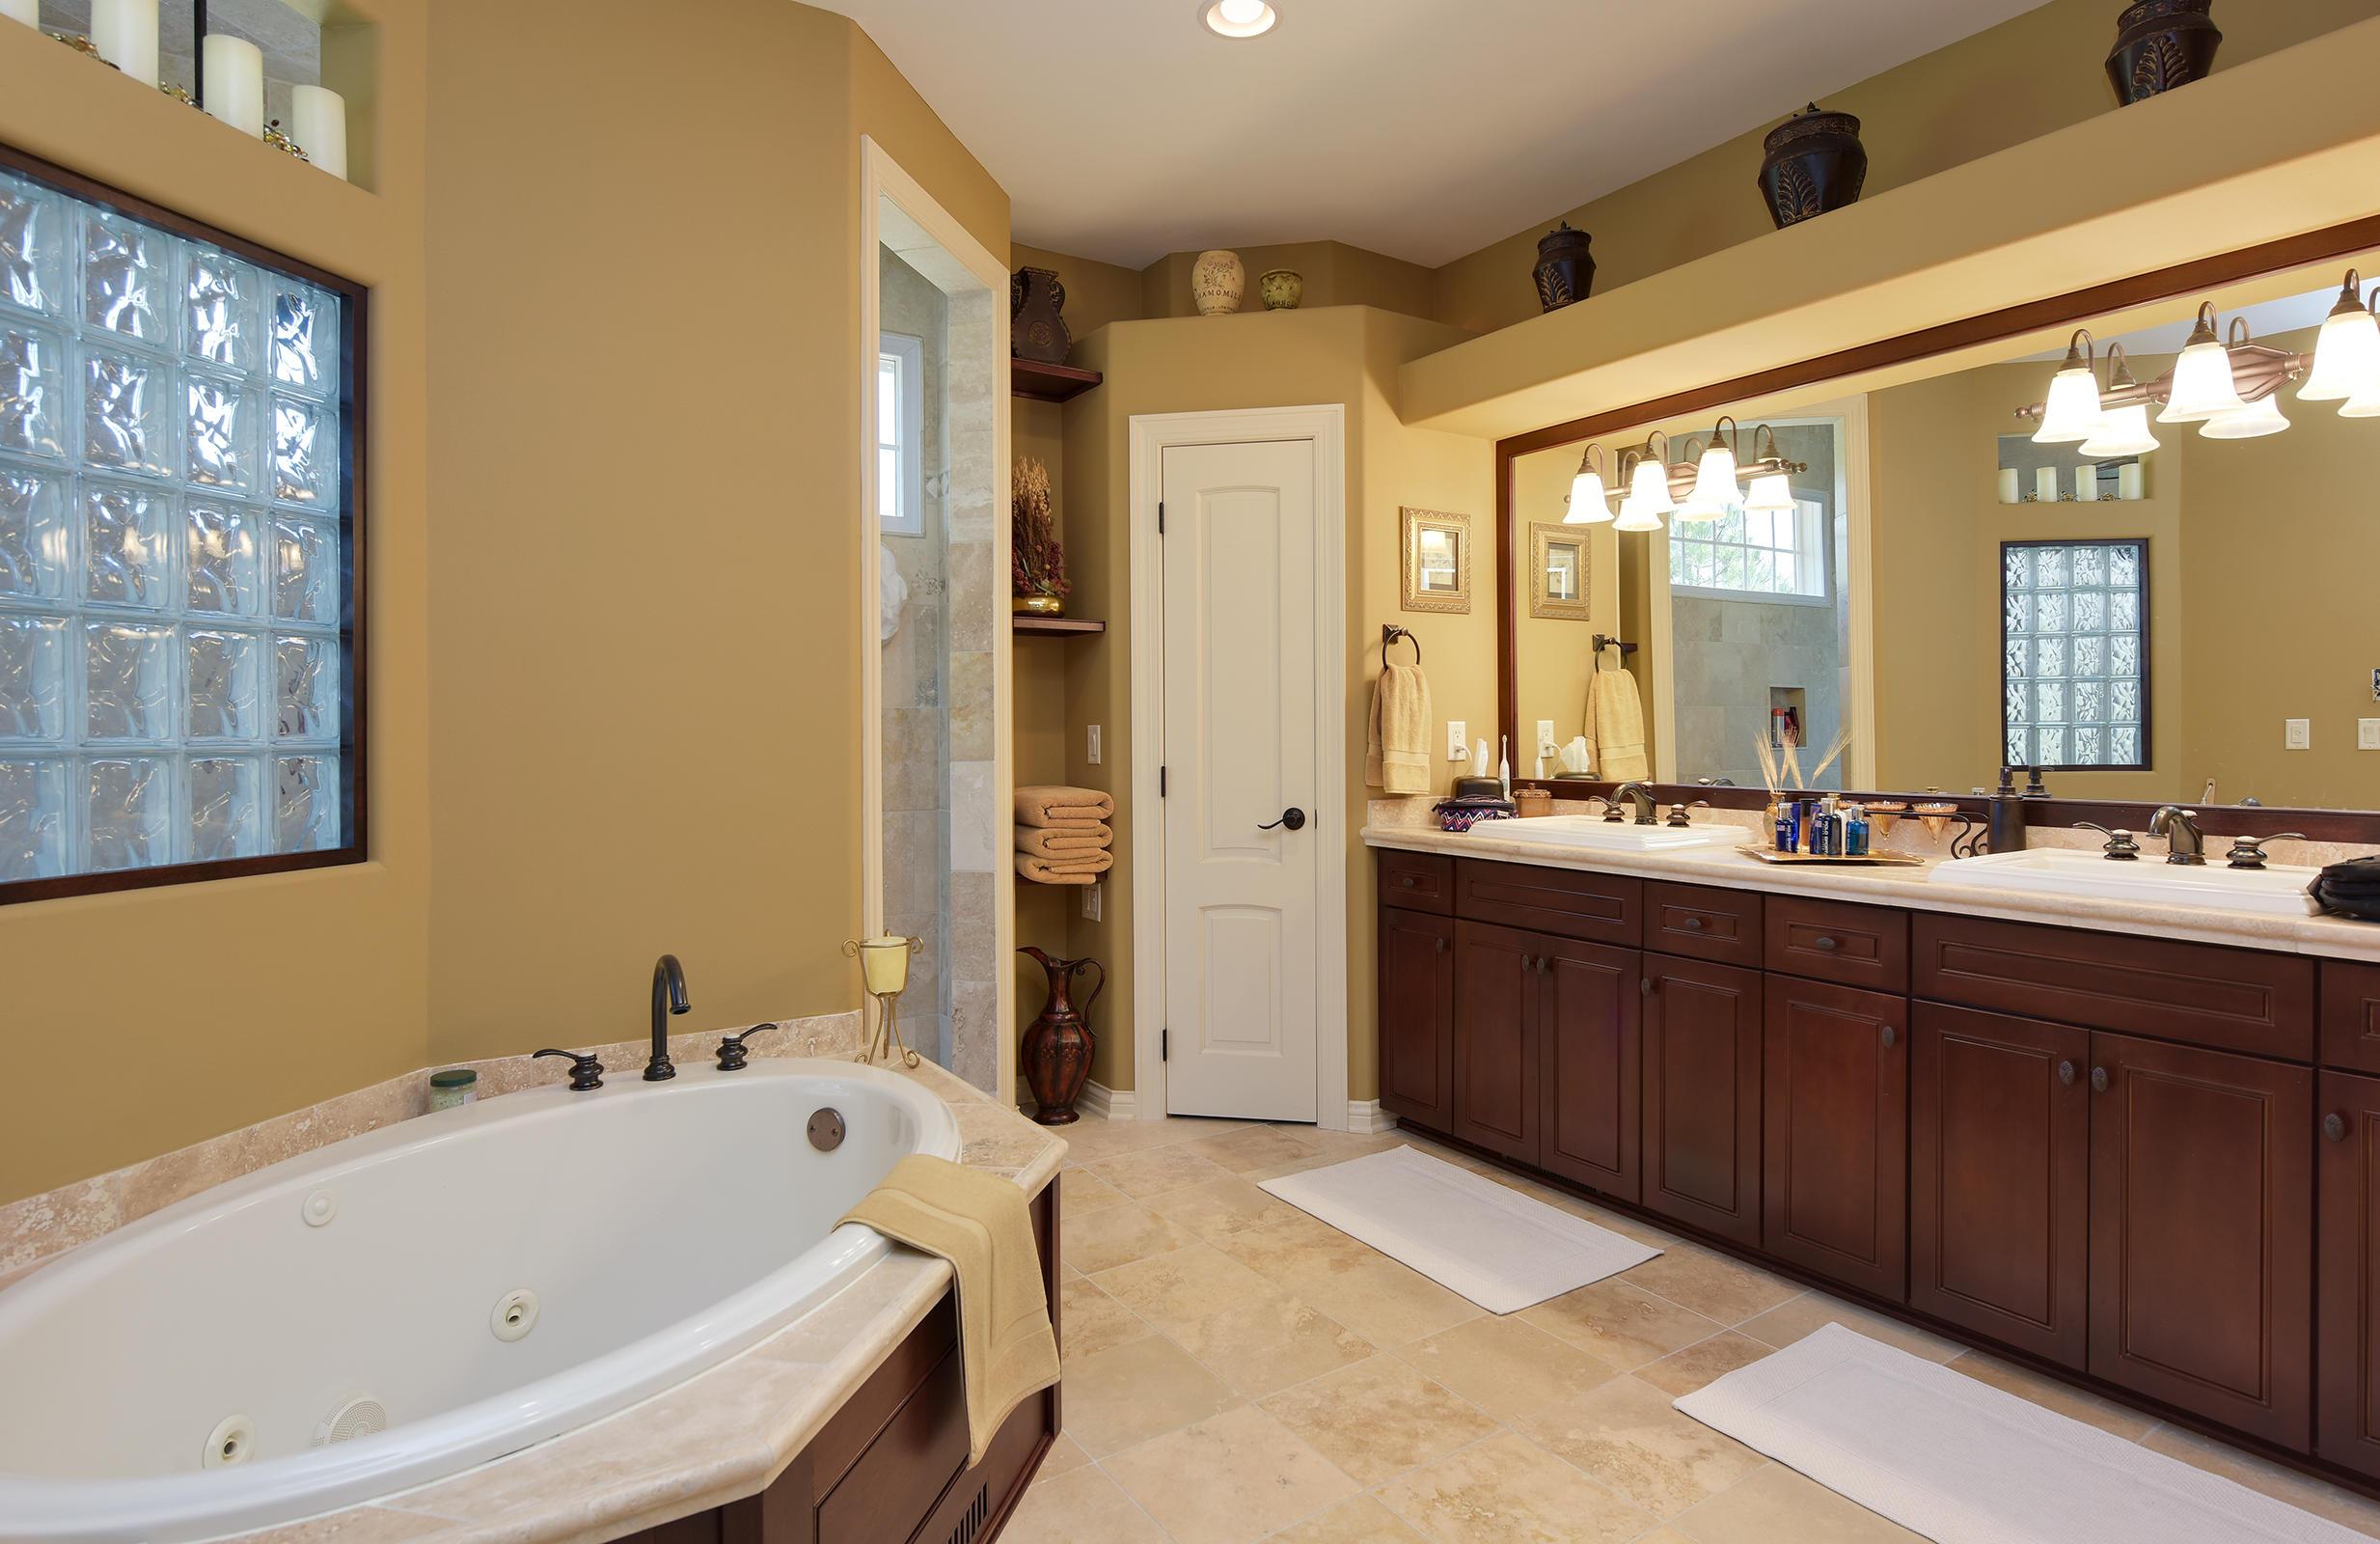 603 Thornbush Cir, Hartland, Wisconsin 53029, 5 Bedrooms Bedrooms, 18 Rooms Rooms,4 BathroomsBathrooms,Single-Family,For Sale,Thornbush Cir,1613068